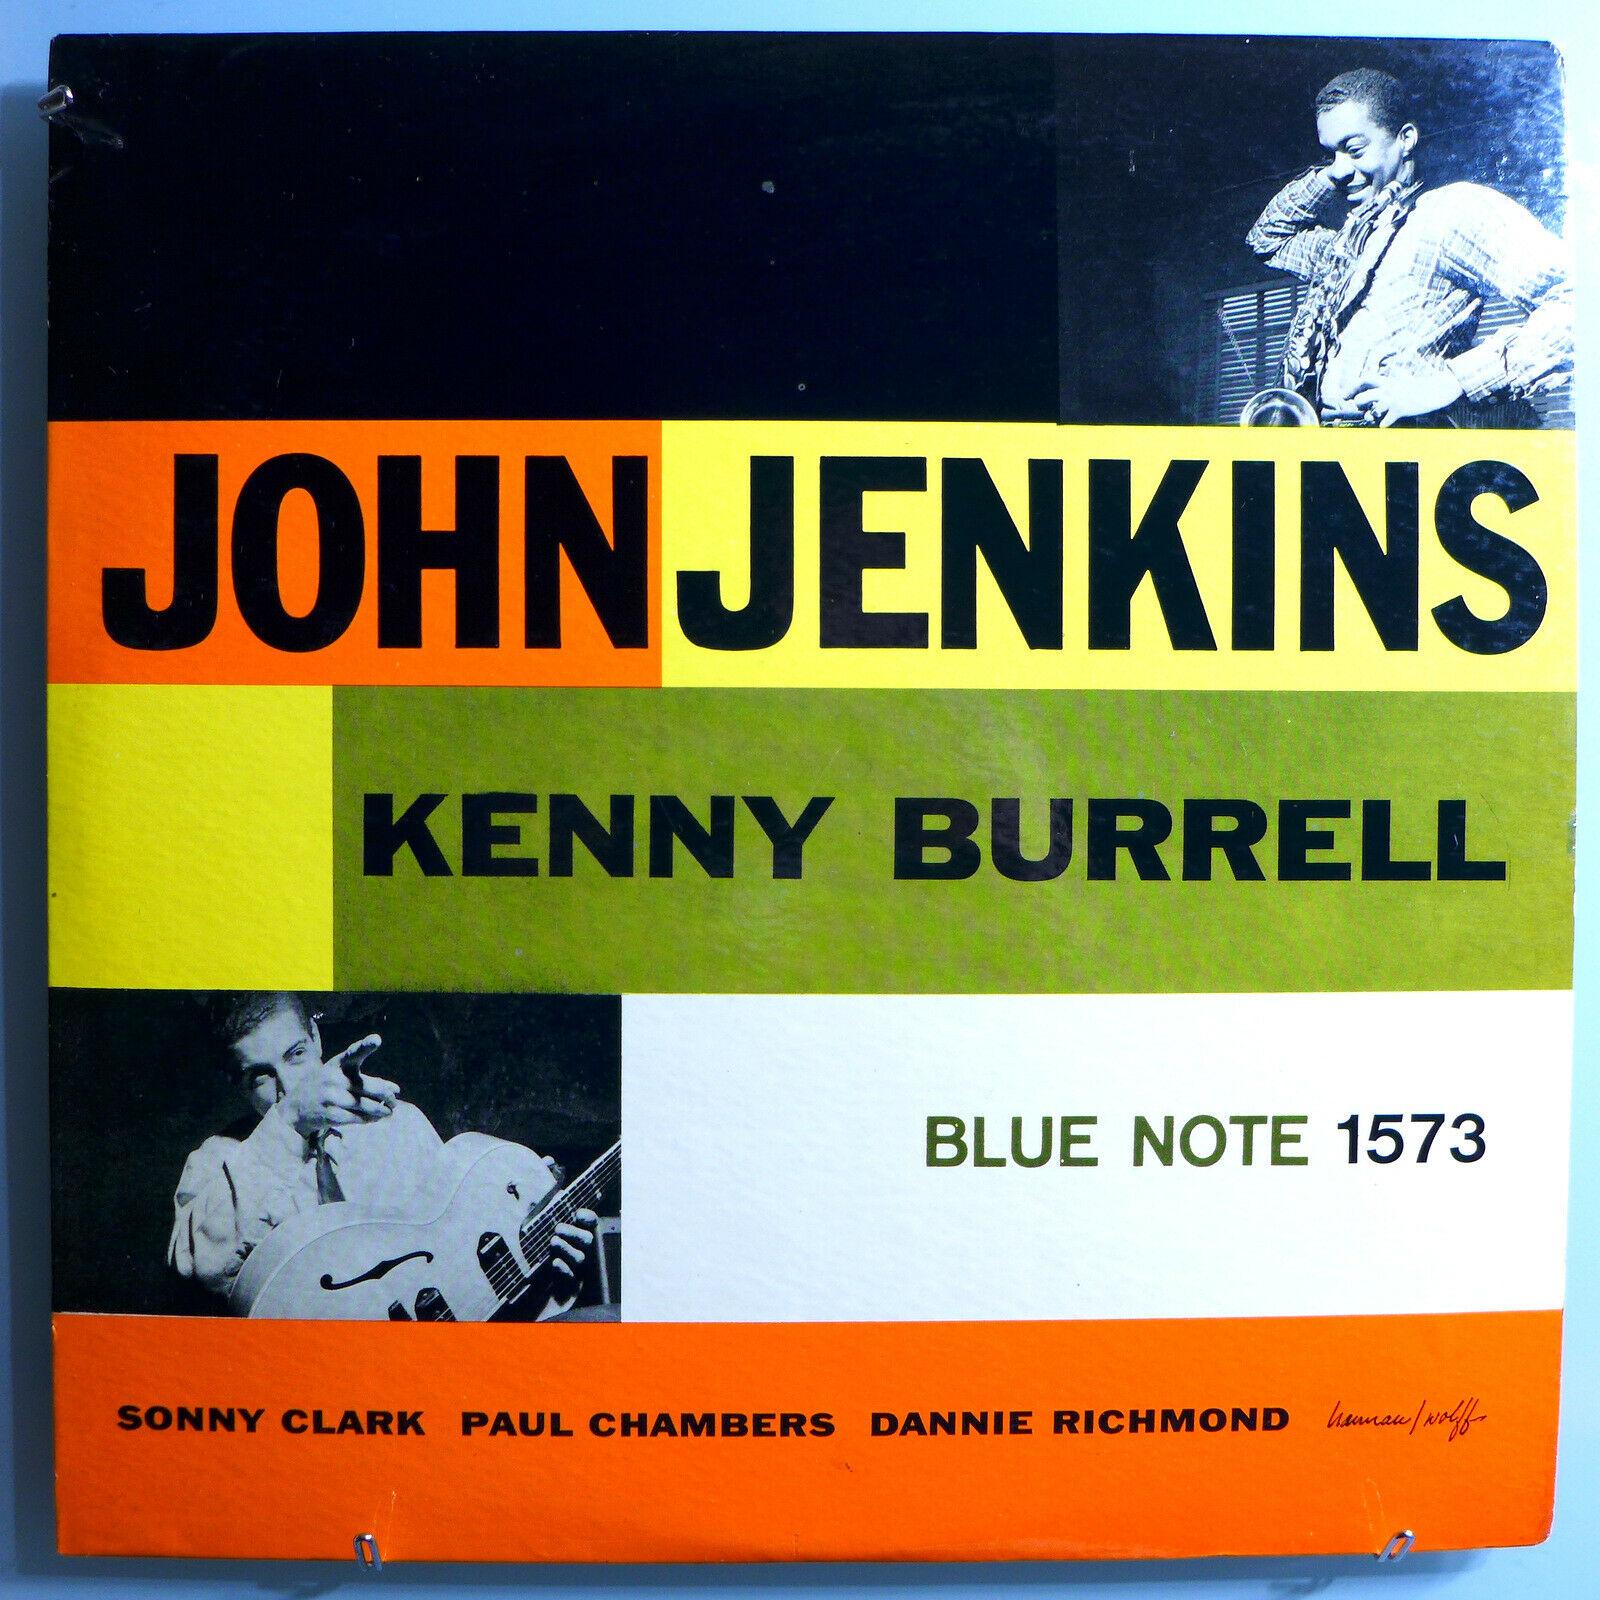 JOHN JENKINS w/KENNY BURRELL INSANELY RARE ORIG 1957 BLUE NOTE MONO LP BLP-1573